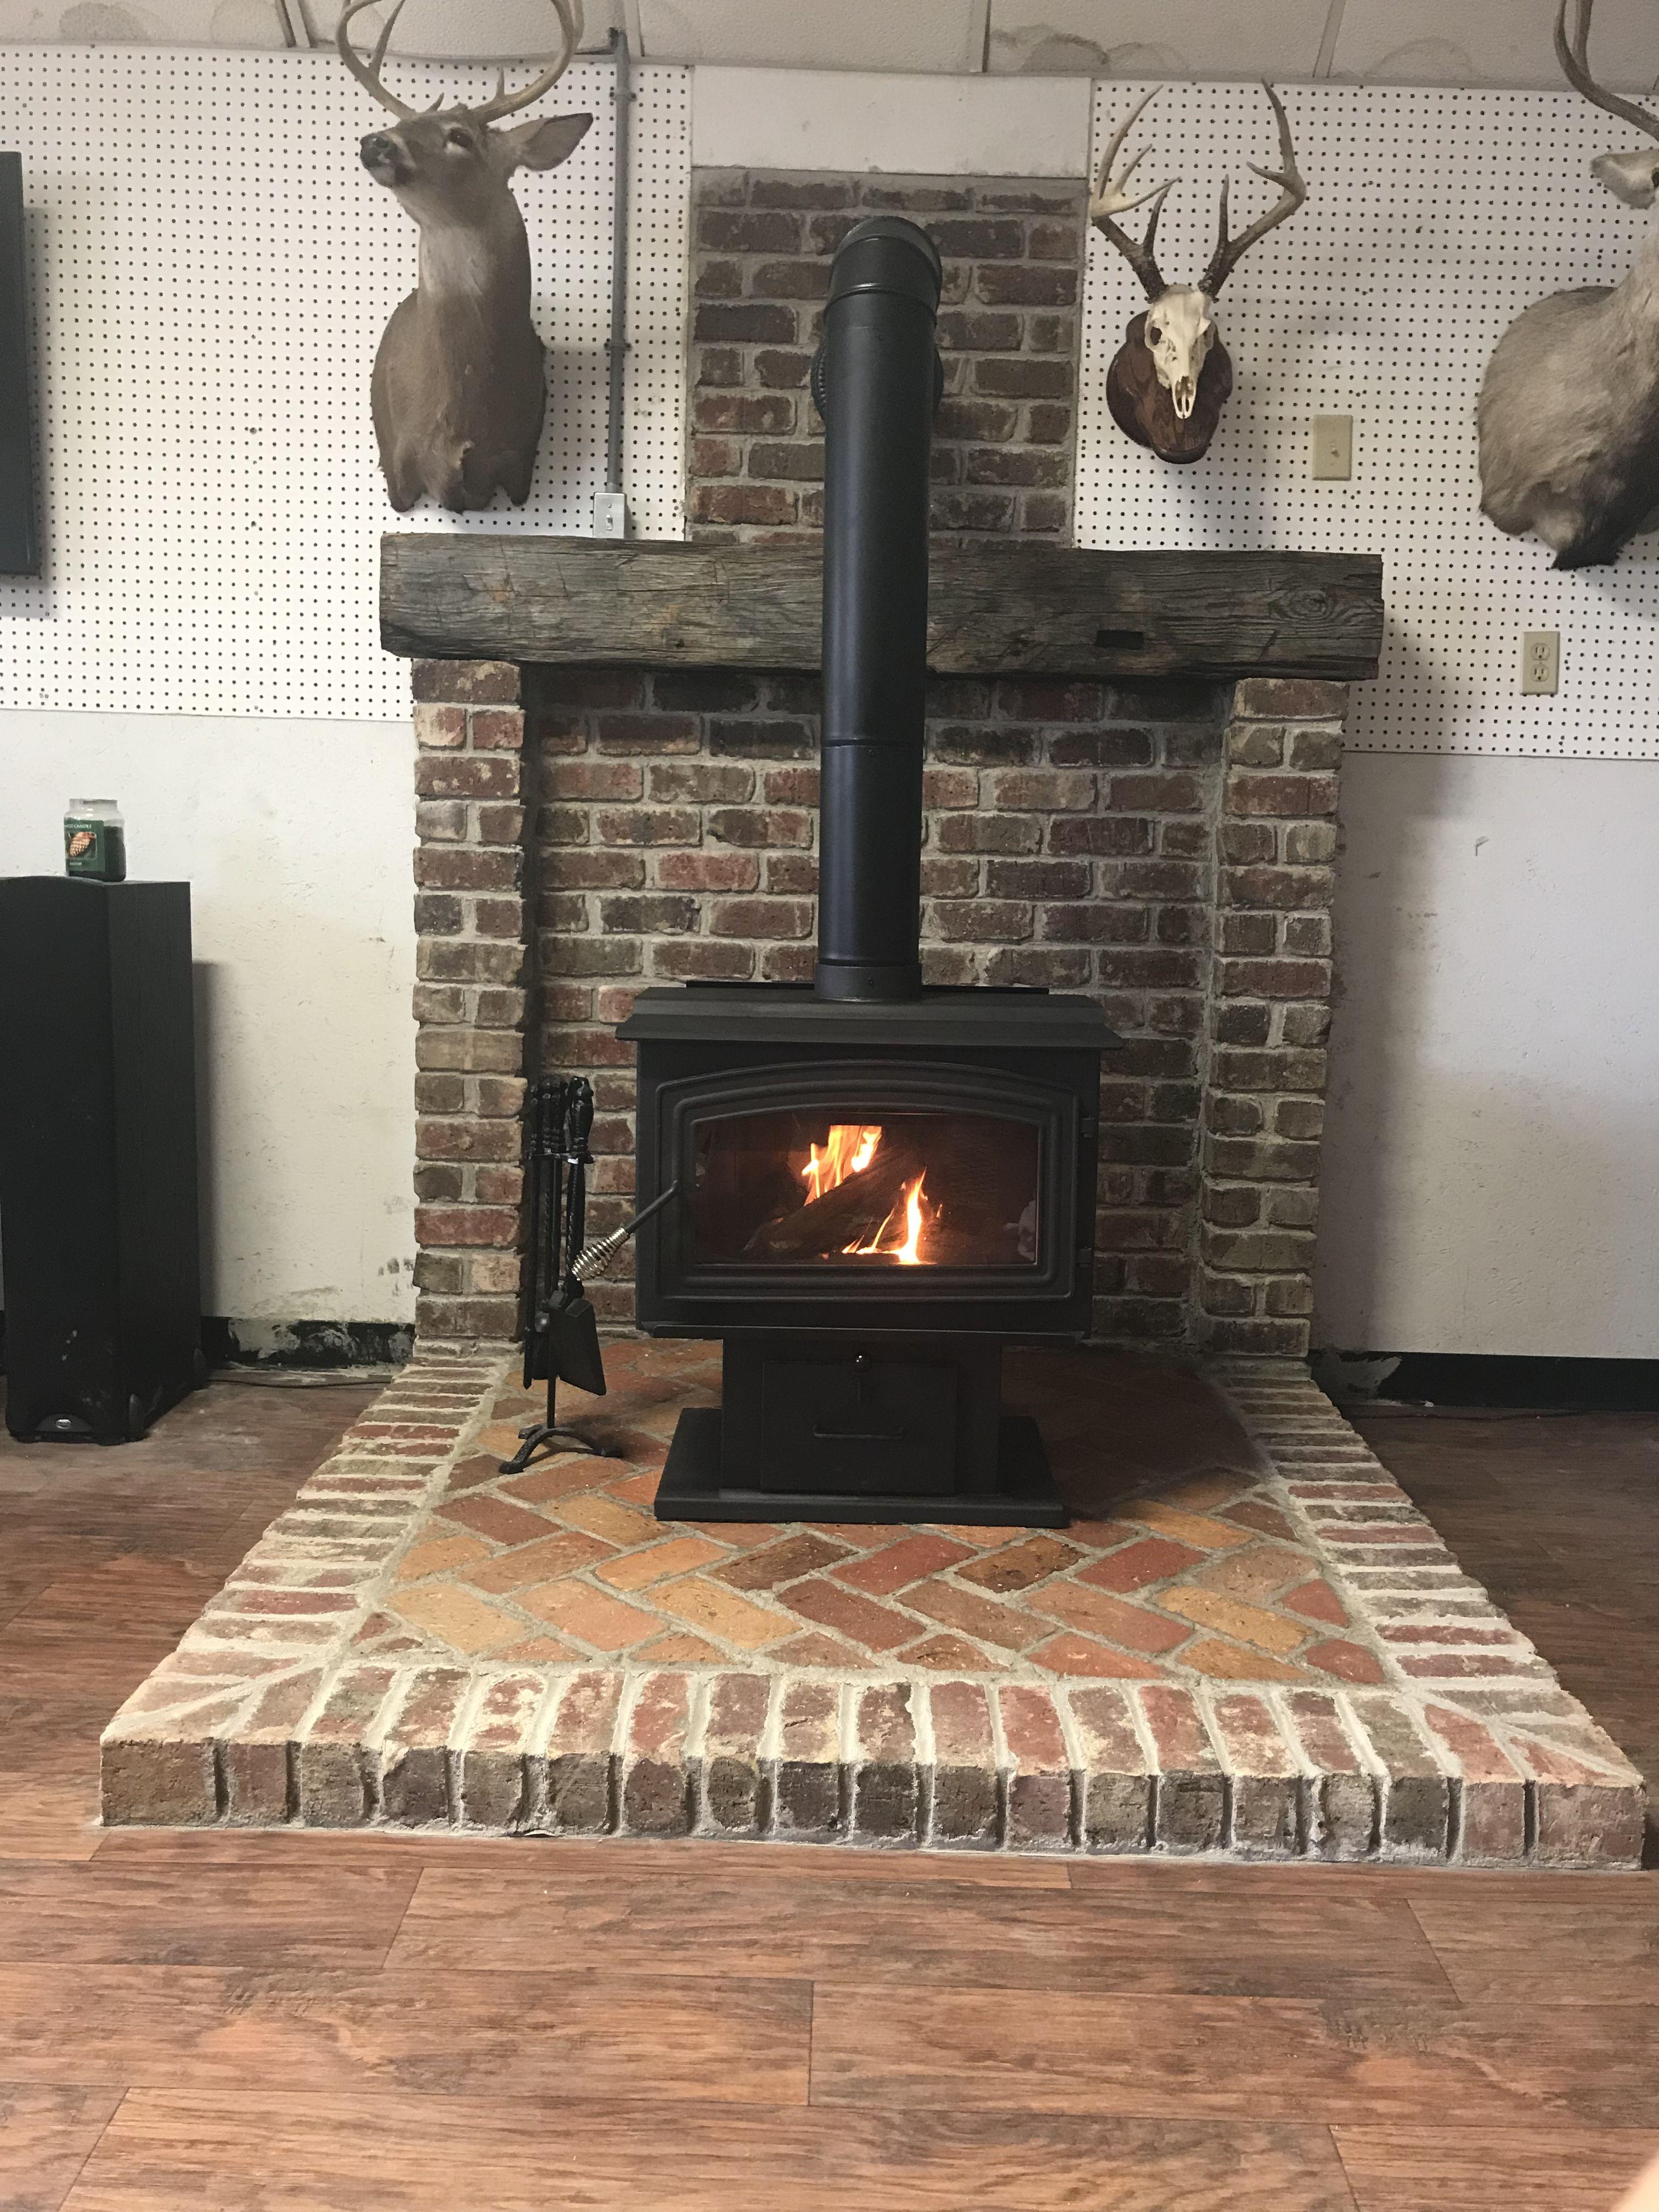 Wood Stove With Brick Surround Herringbone Hearth Pattern And